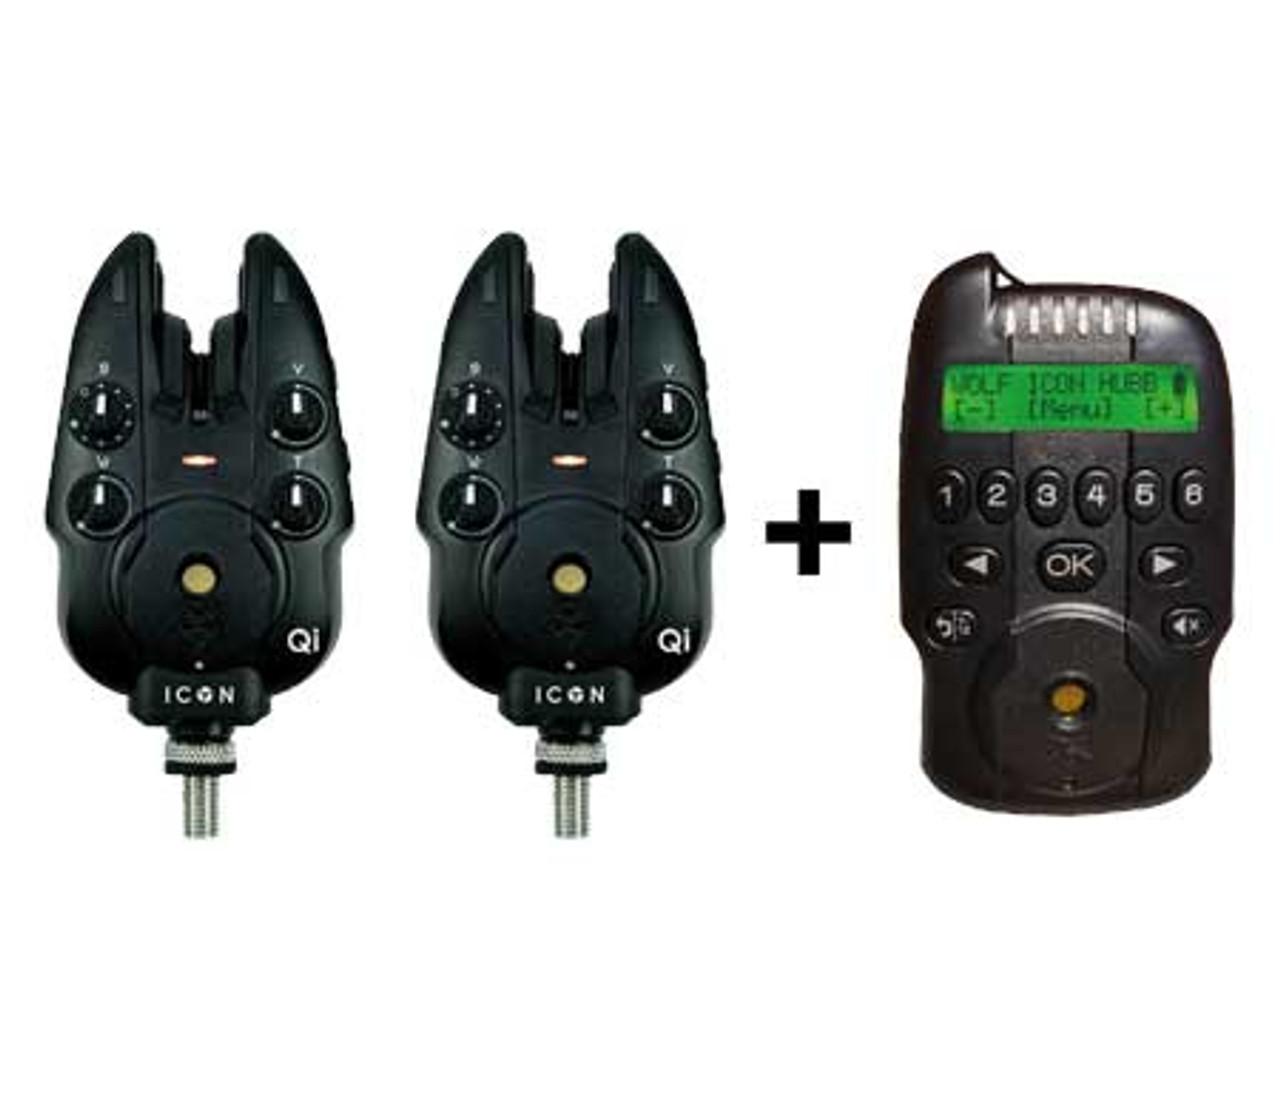 Wolf Icon QI 2 Rod Set + Hubb